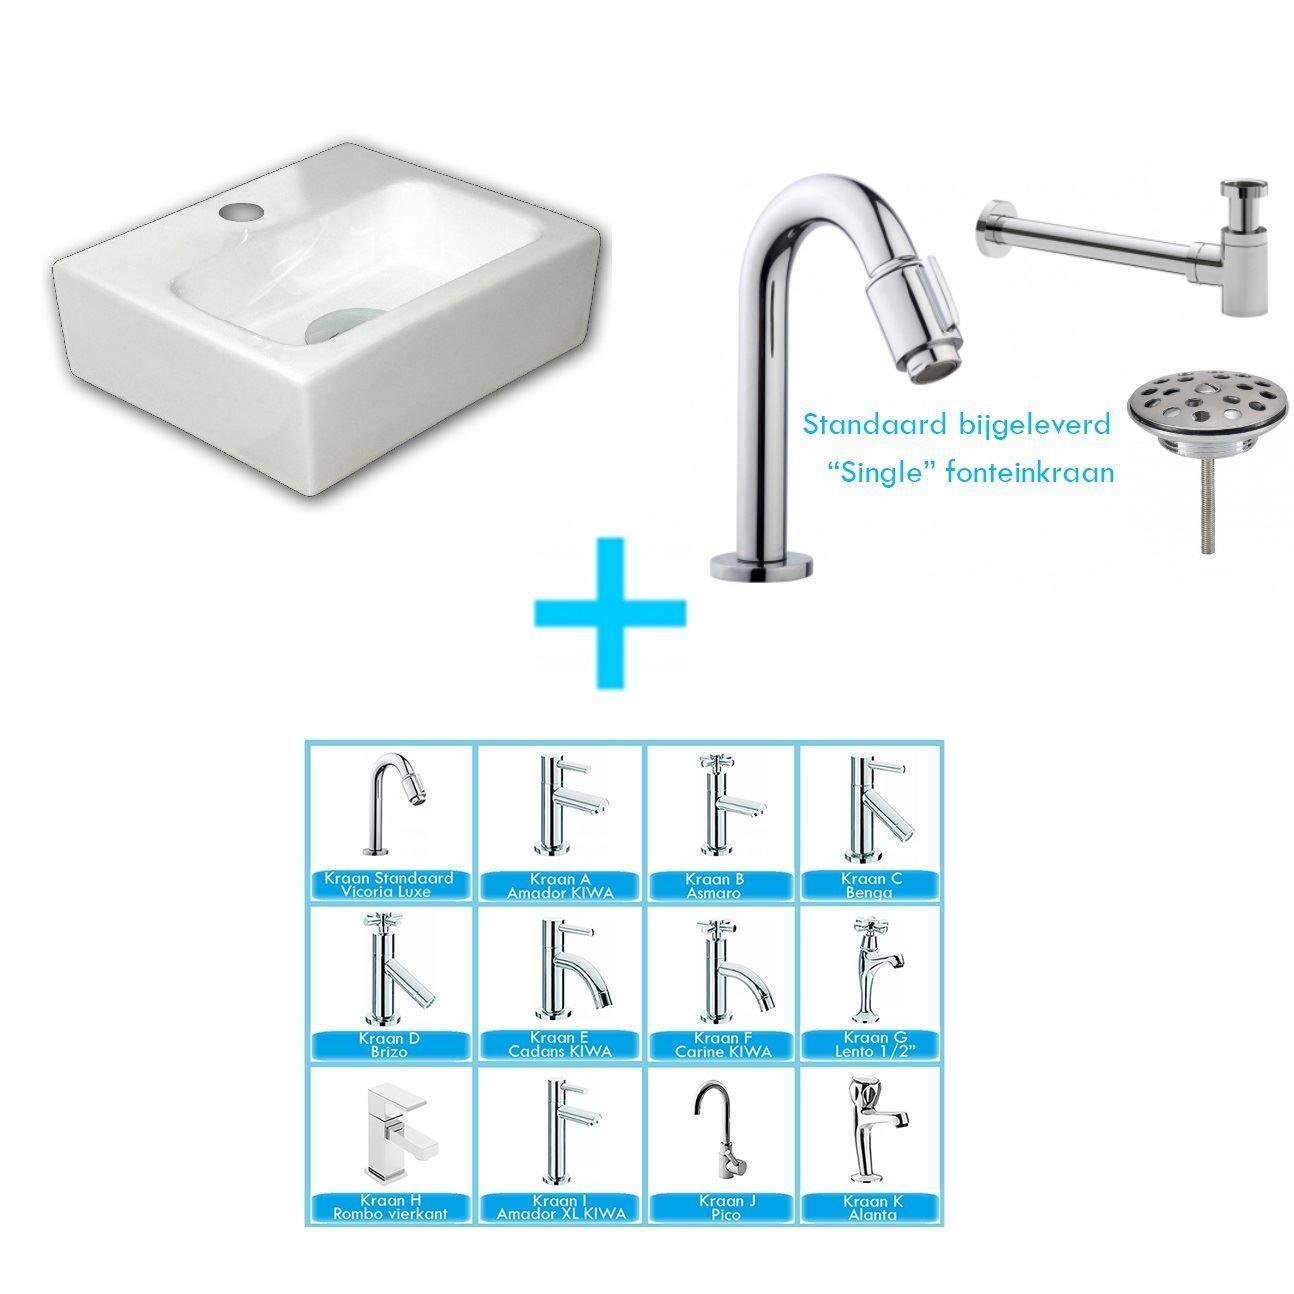 Sanitair-producten > Wastafels > Fontein toilet